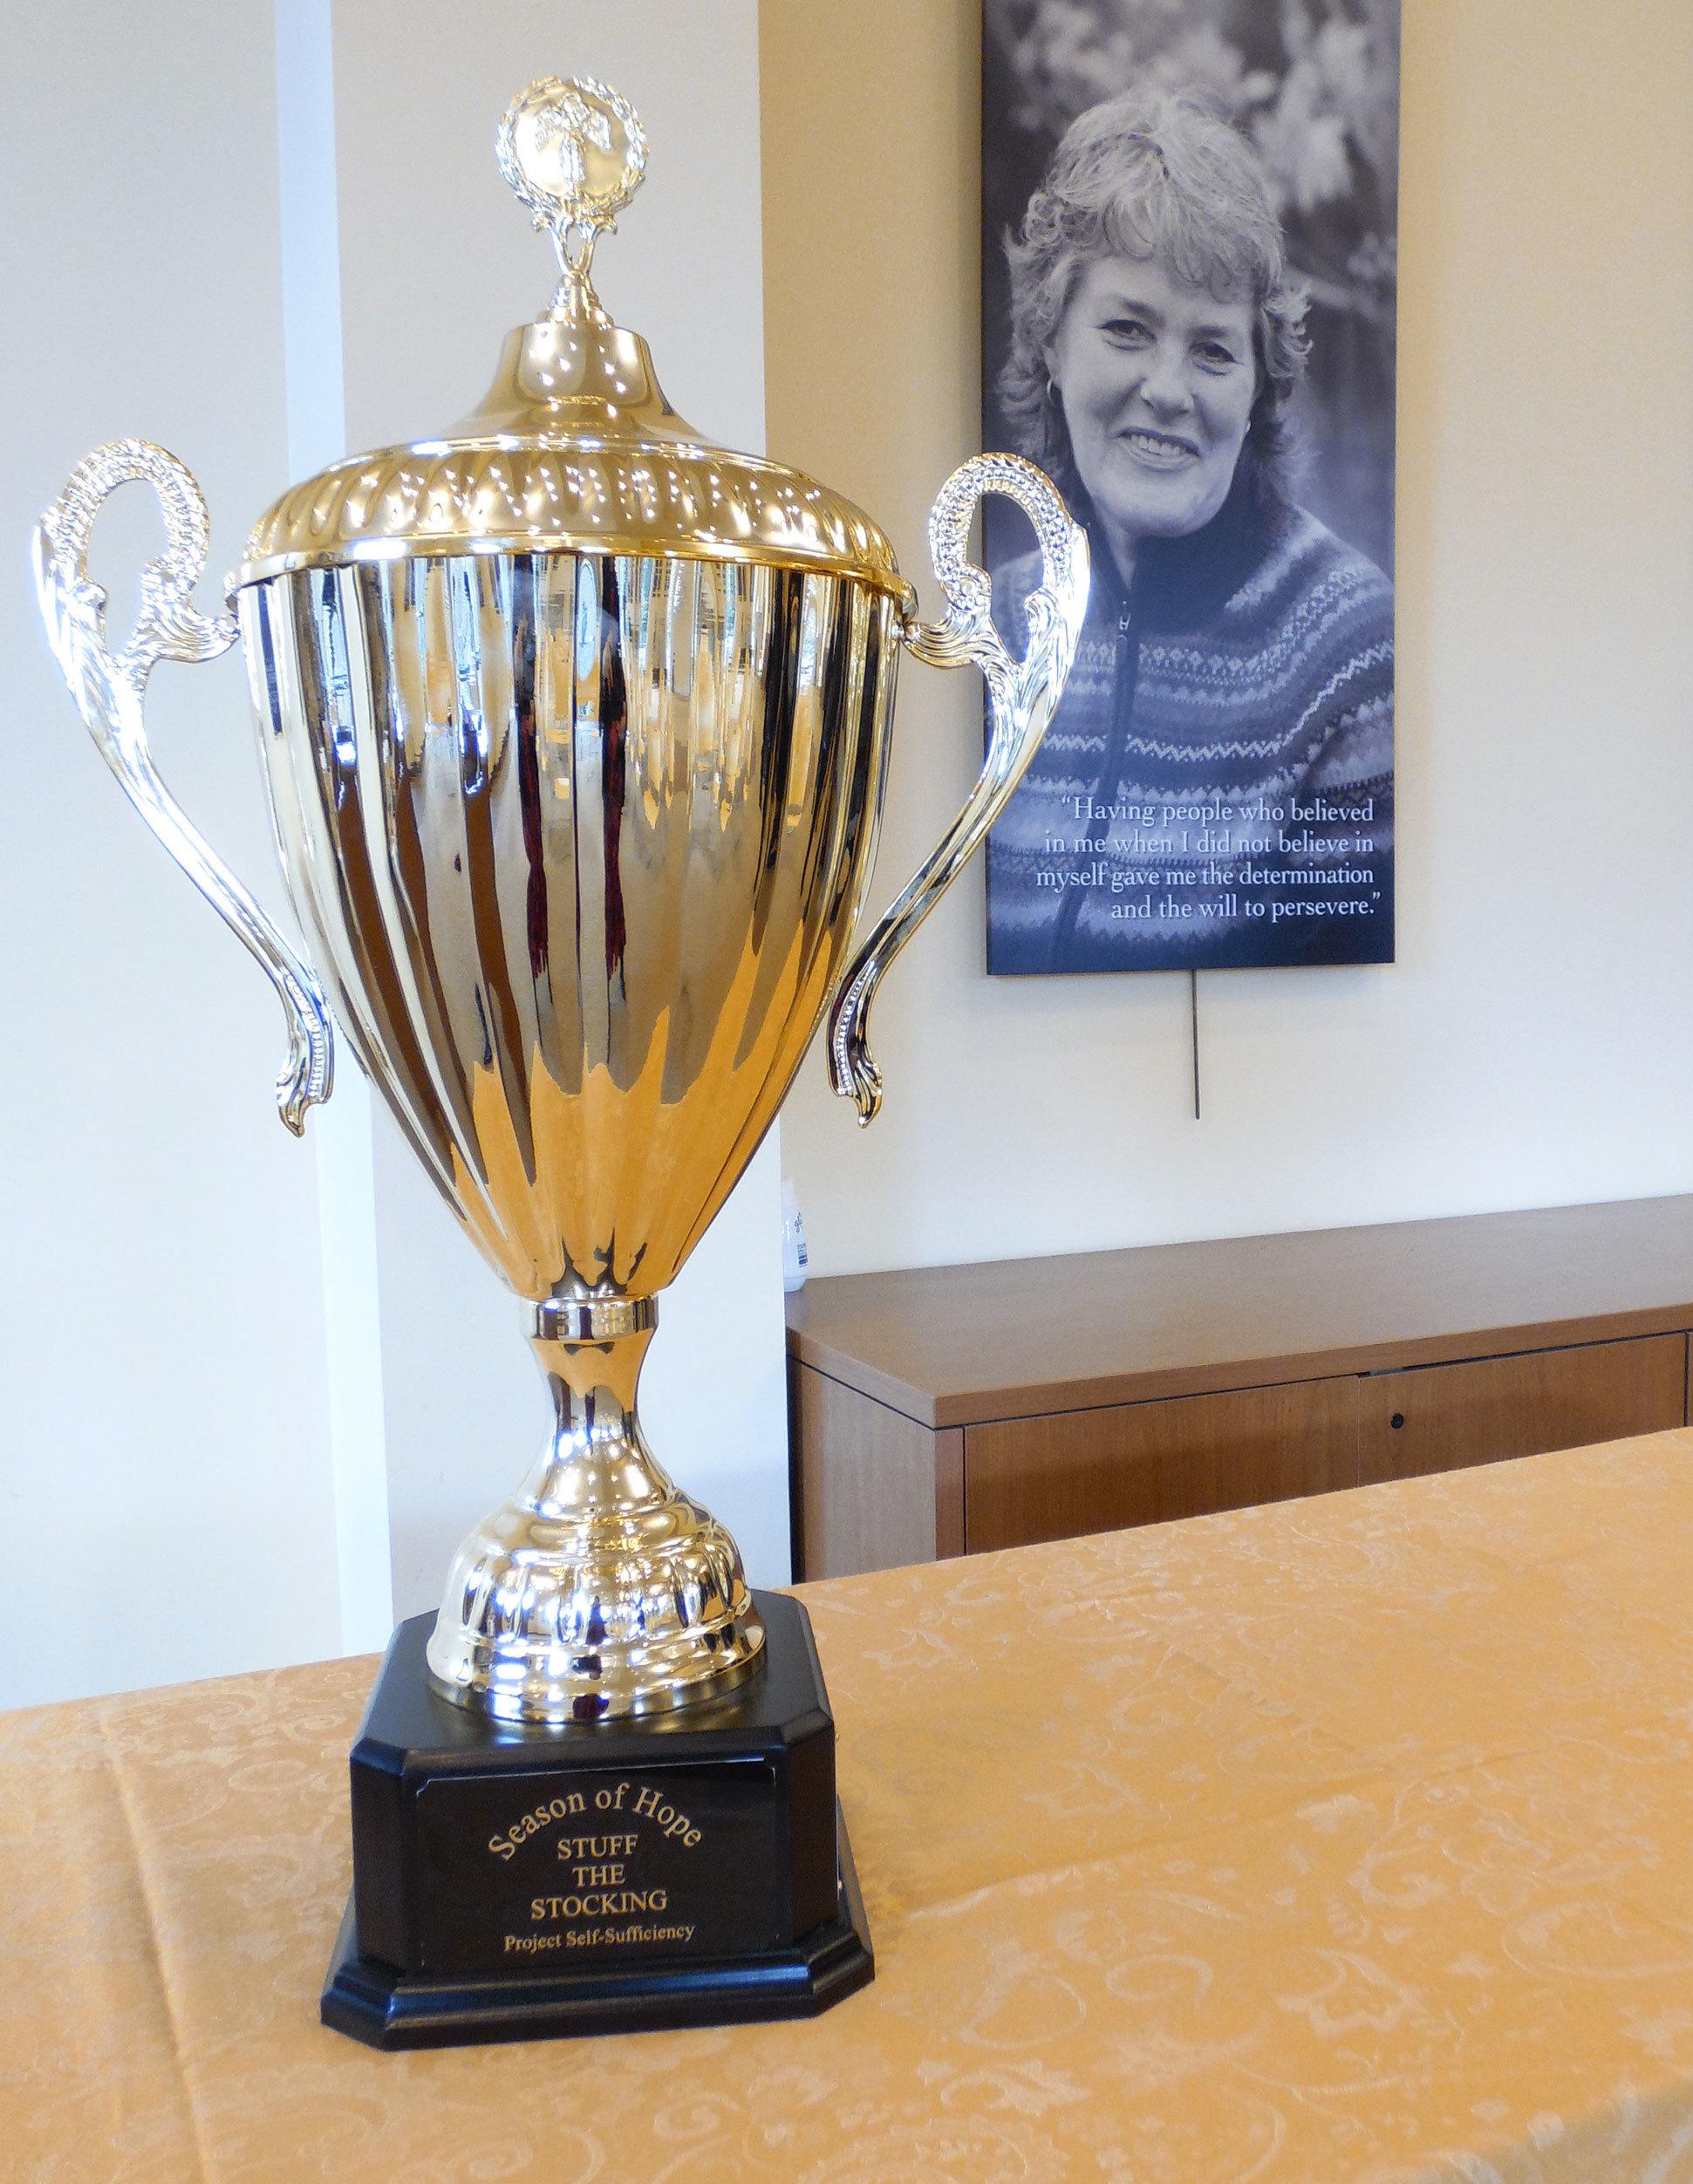 76f31417bc01793ff799_Season-of-Hope-trophy.jpg